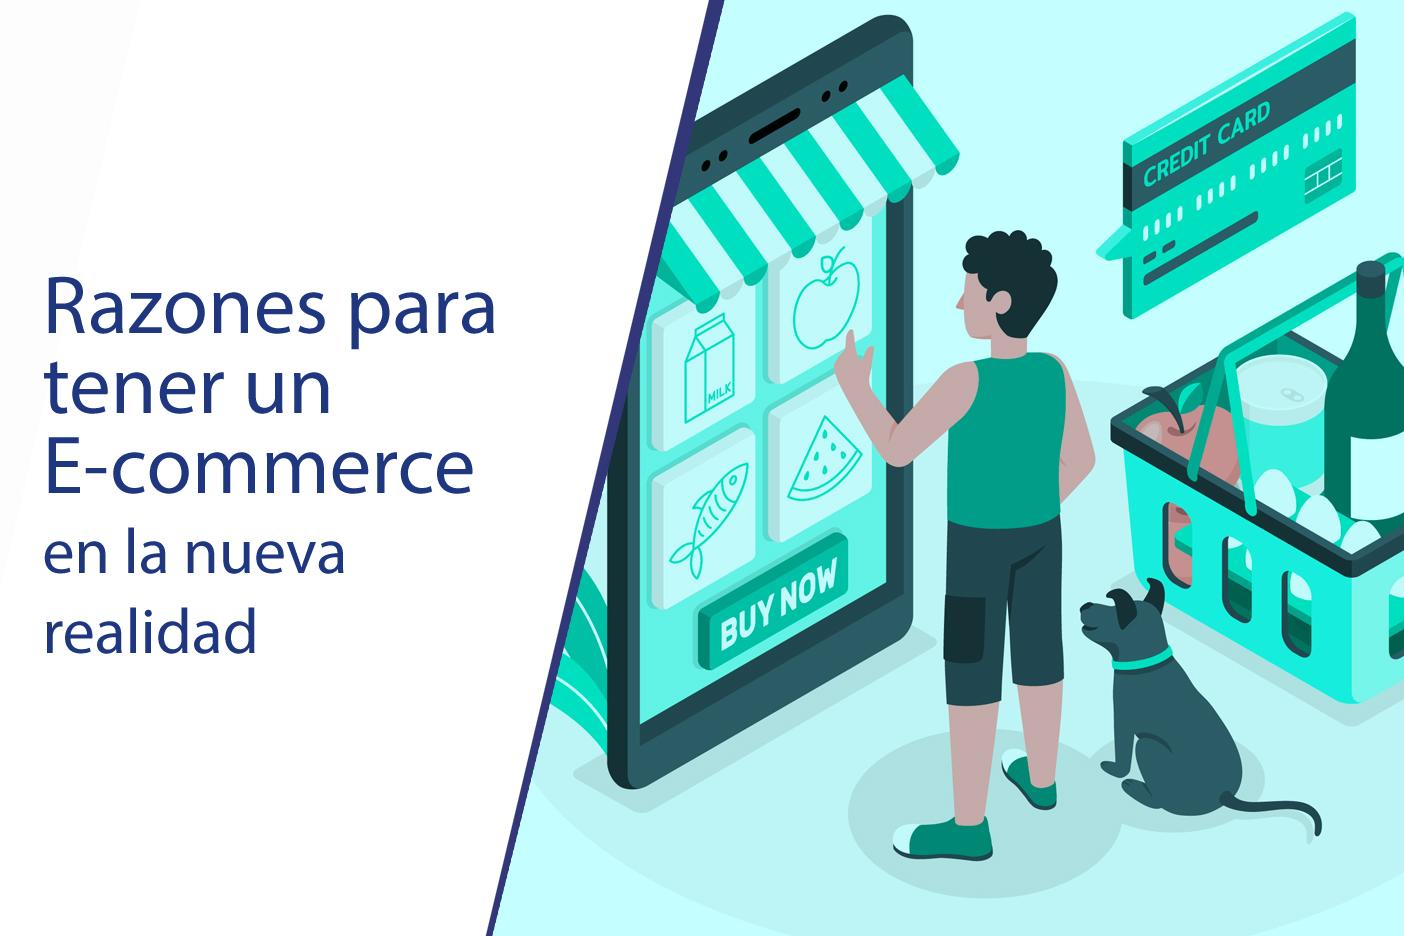 Razones para tener un E-commerce